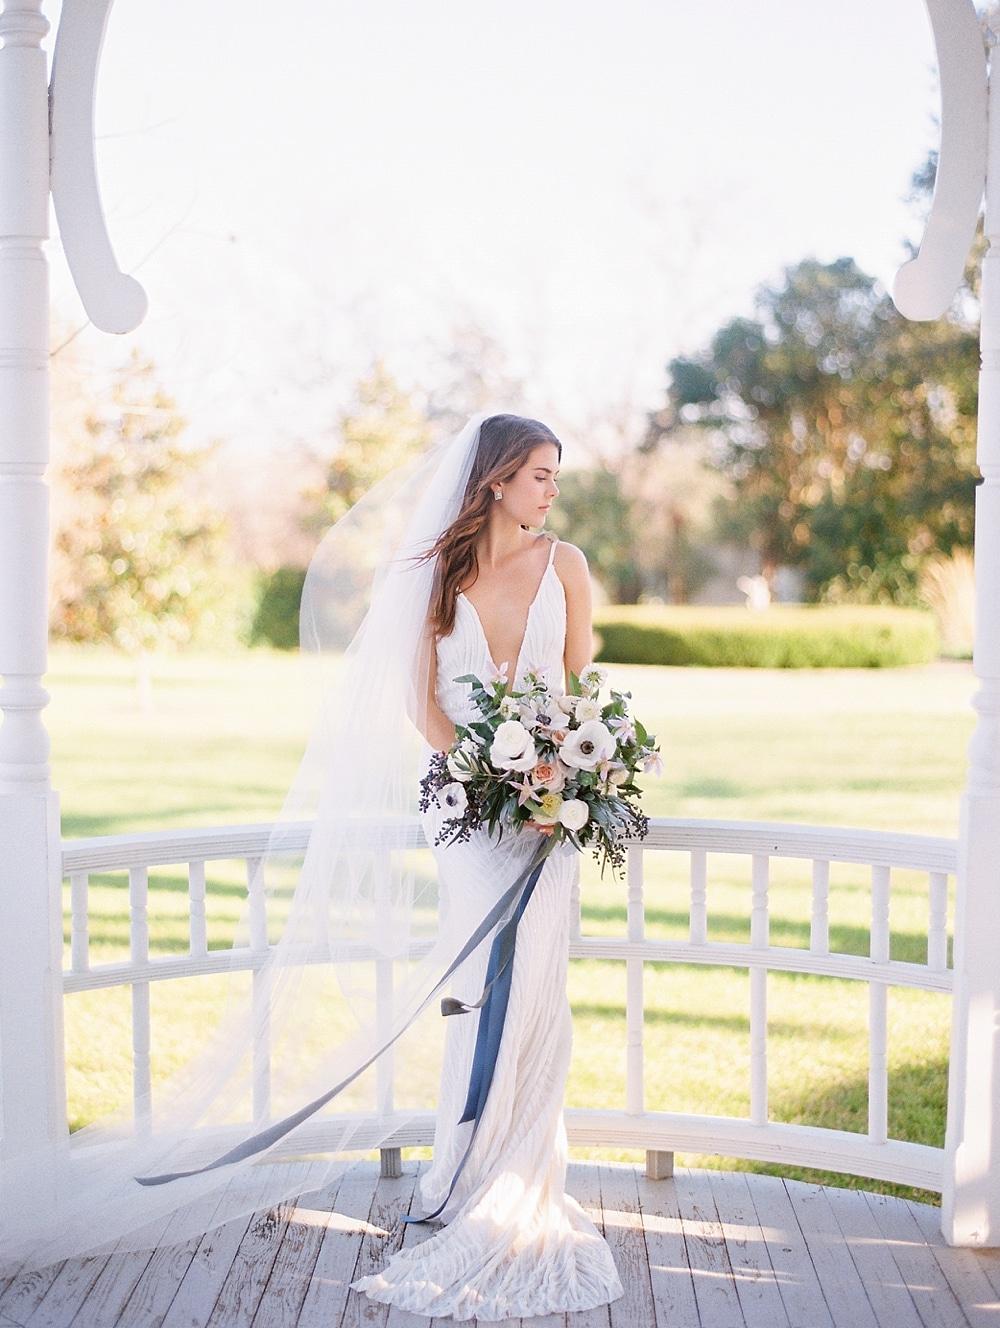 Kristin-La-Voie-Photography-Austin-Wedding-Photographer-barr-mansion (19 of 86)